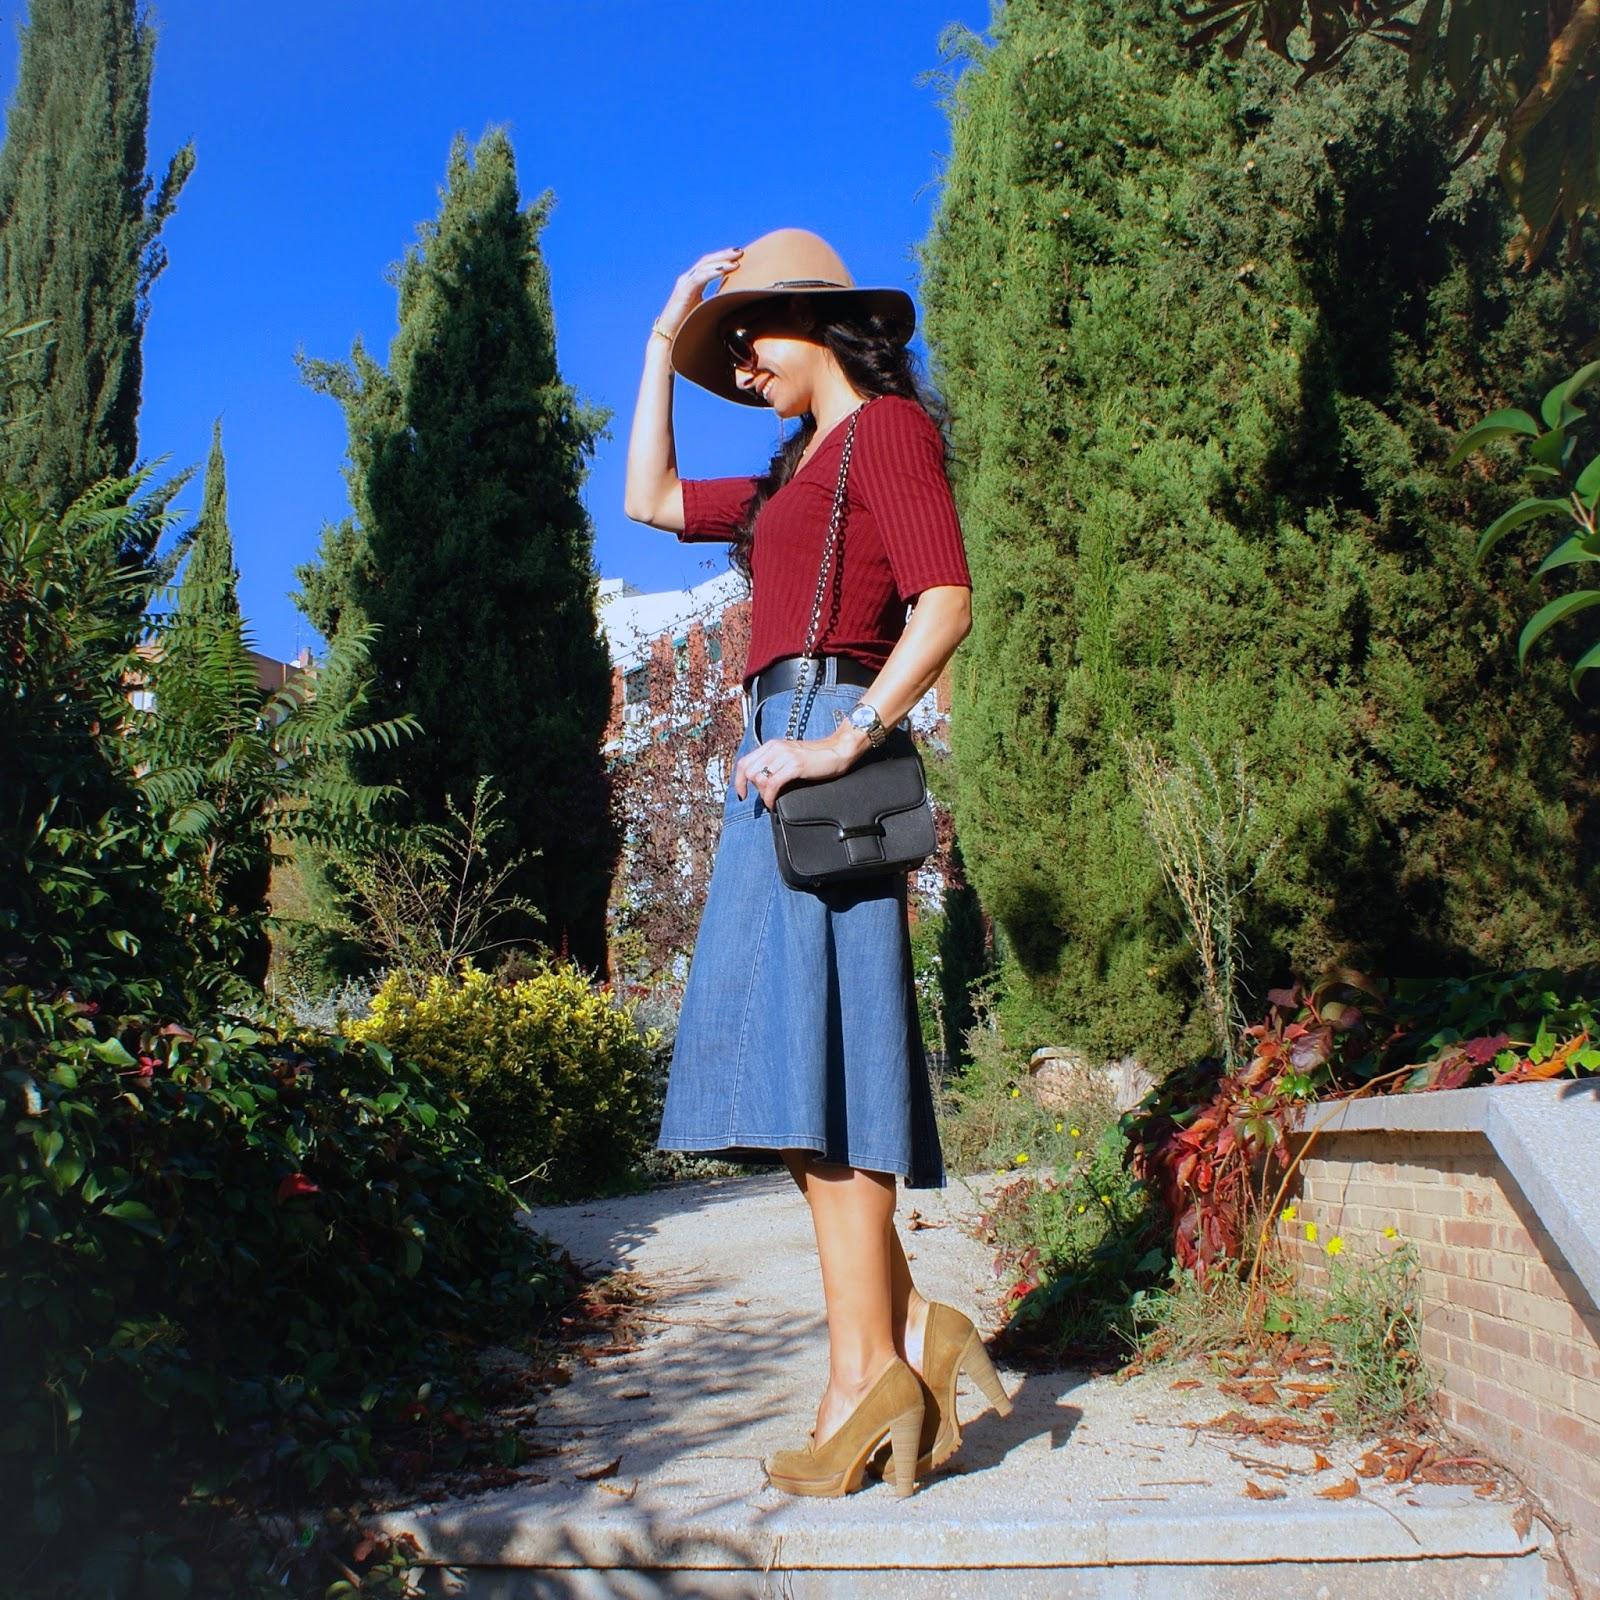 La caprichossa mi diario runner blog de moda belleza Bohemian style fashion blogs